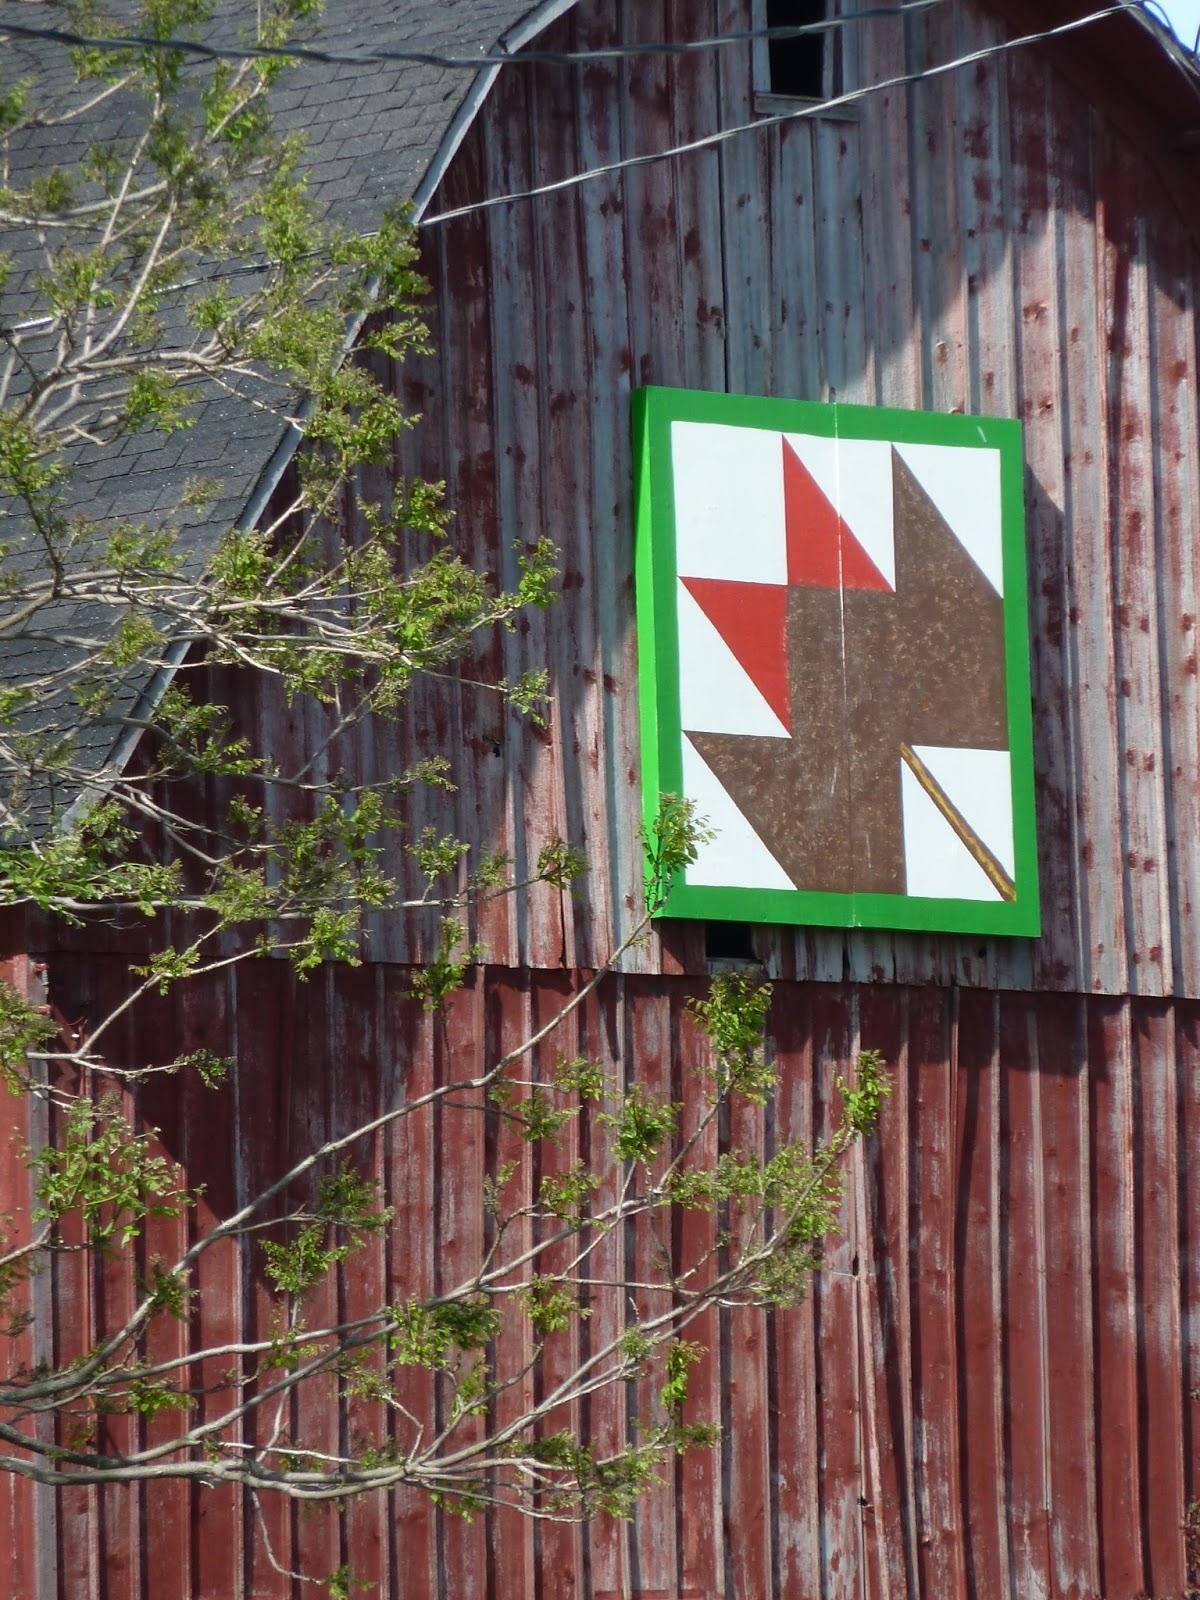 Barn Quilts Kankakee Illinois Barn Trail